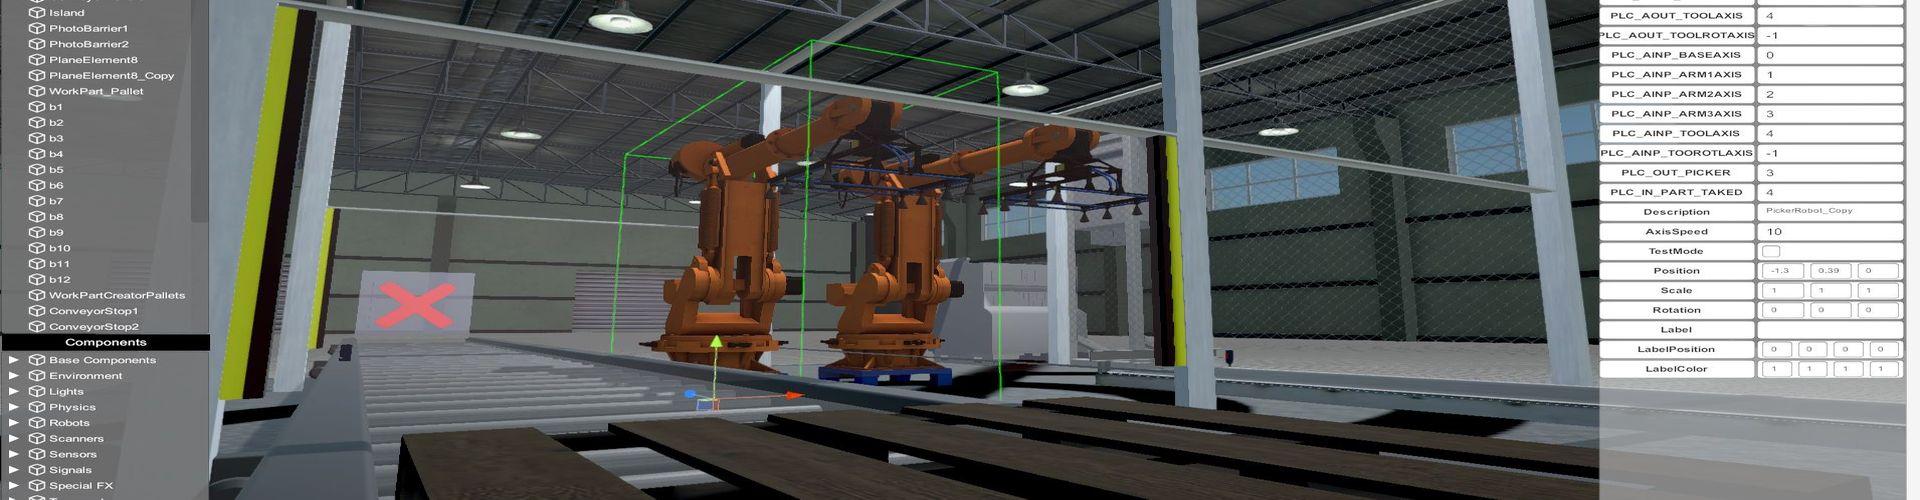 easyplc machines simulator - slide 3